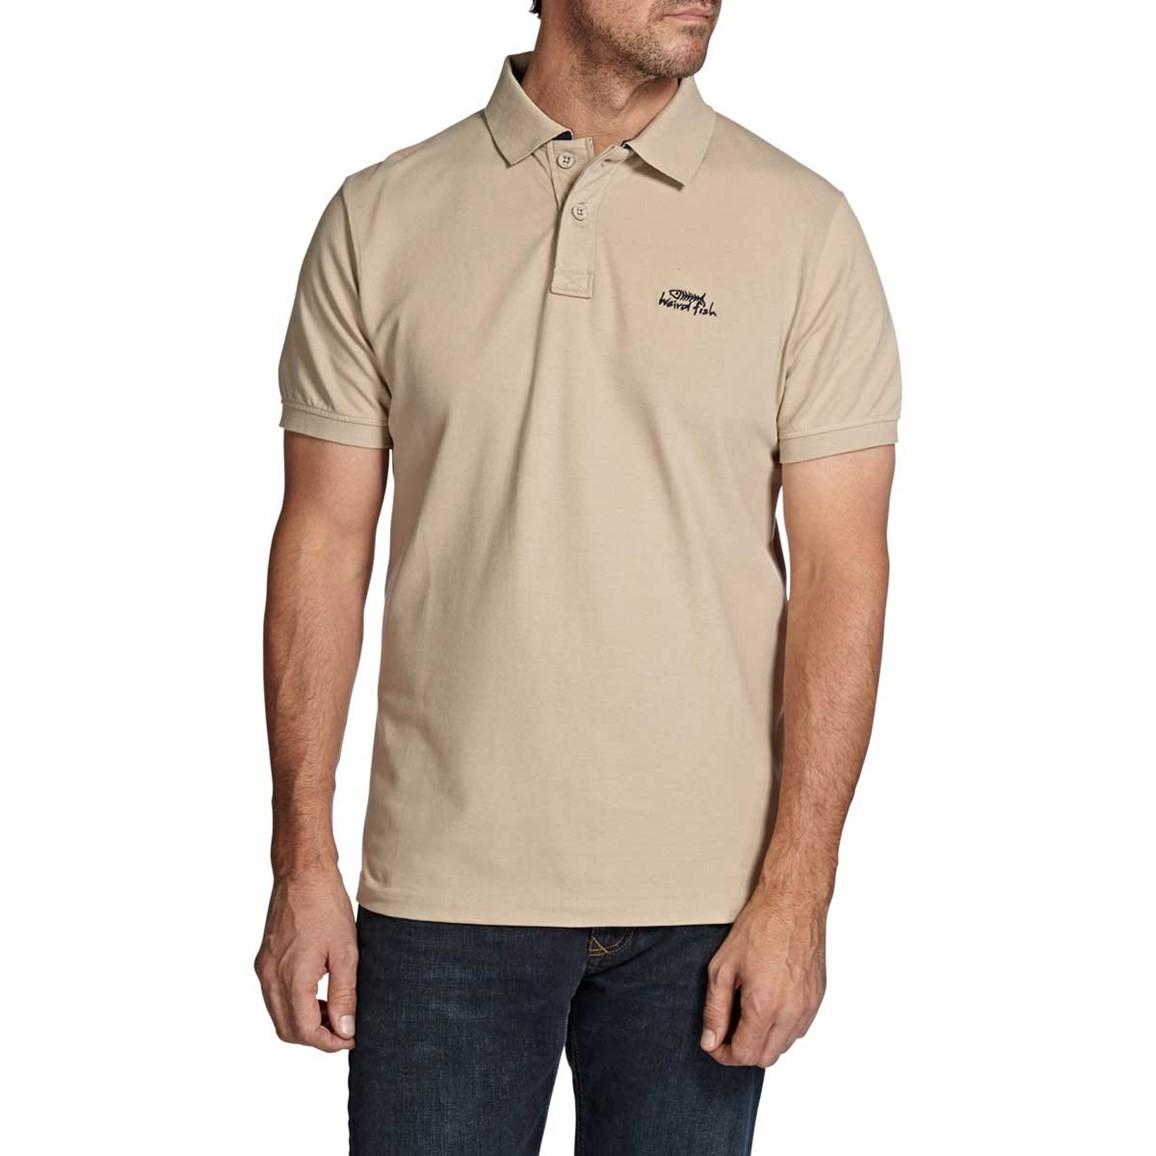 Image of Weird Fish Barros Classic Pique Polo Shirt Pebblestone Size 4XL